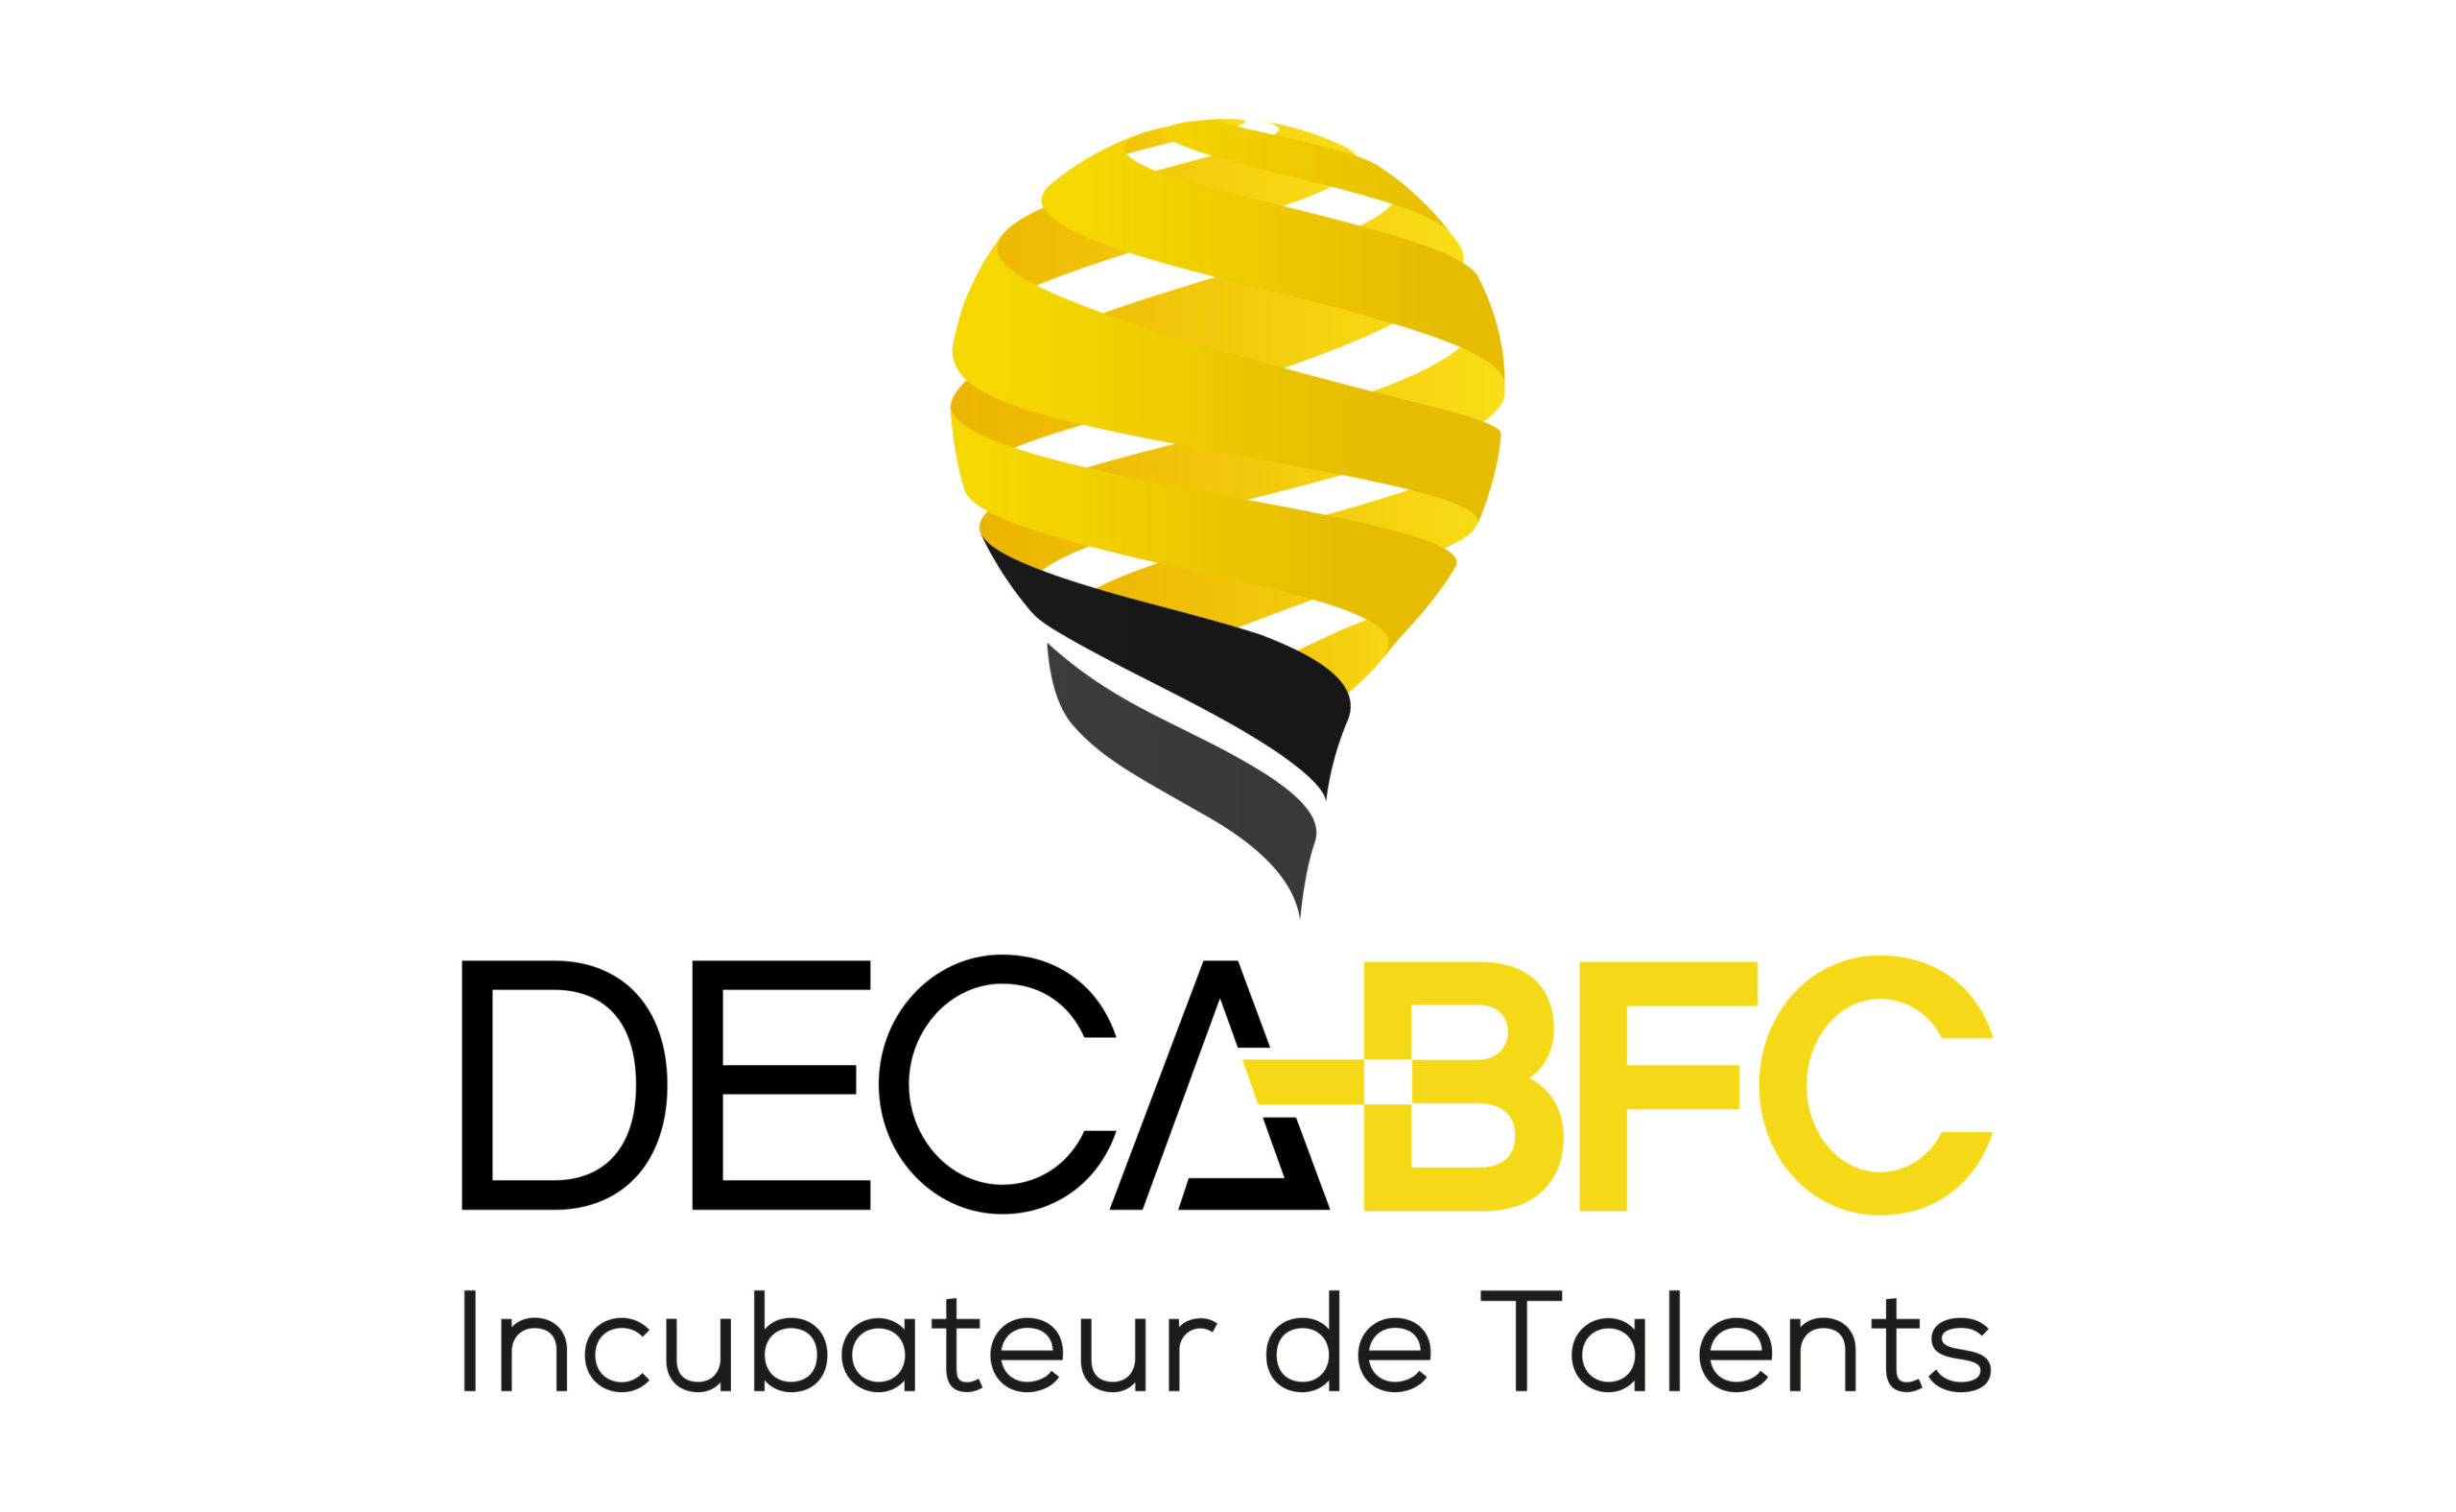 DECA BFC